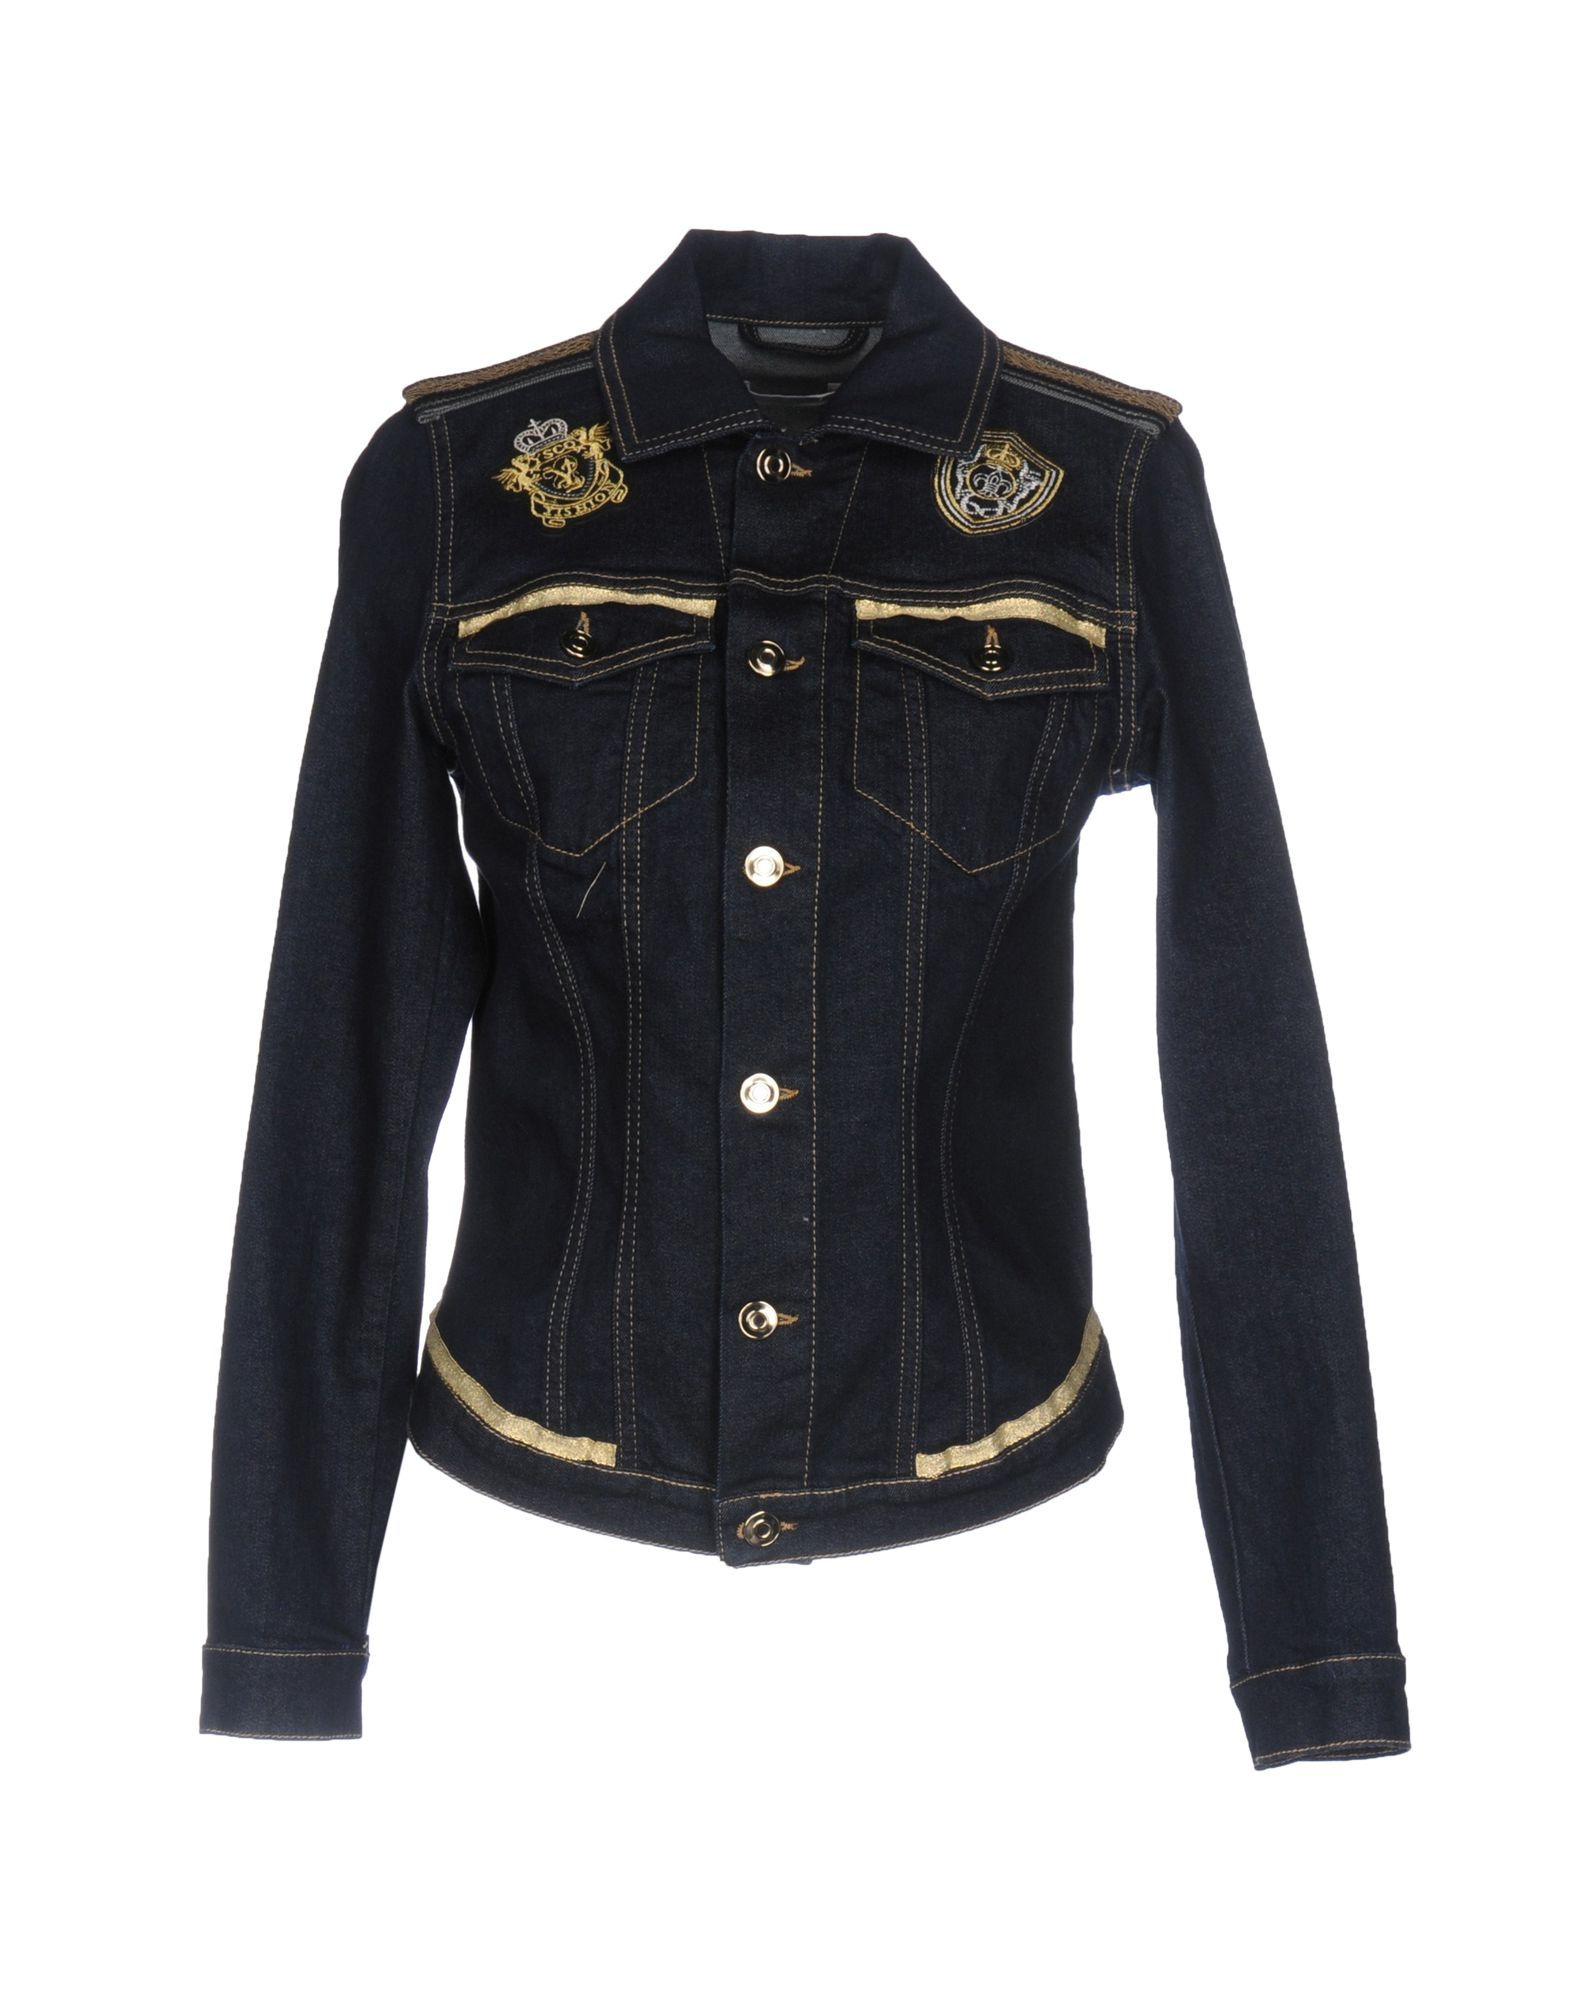 CARLA G. Джинсовая верхняя одежда цены онлайн